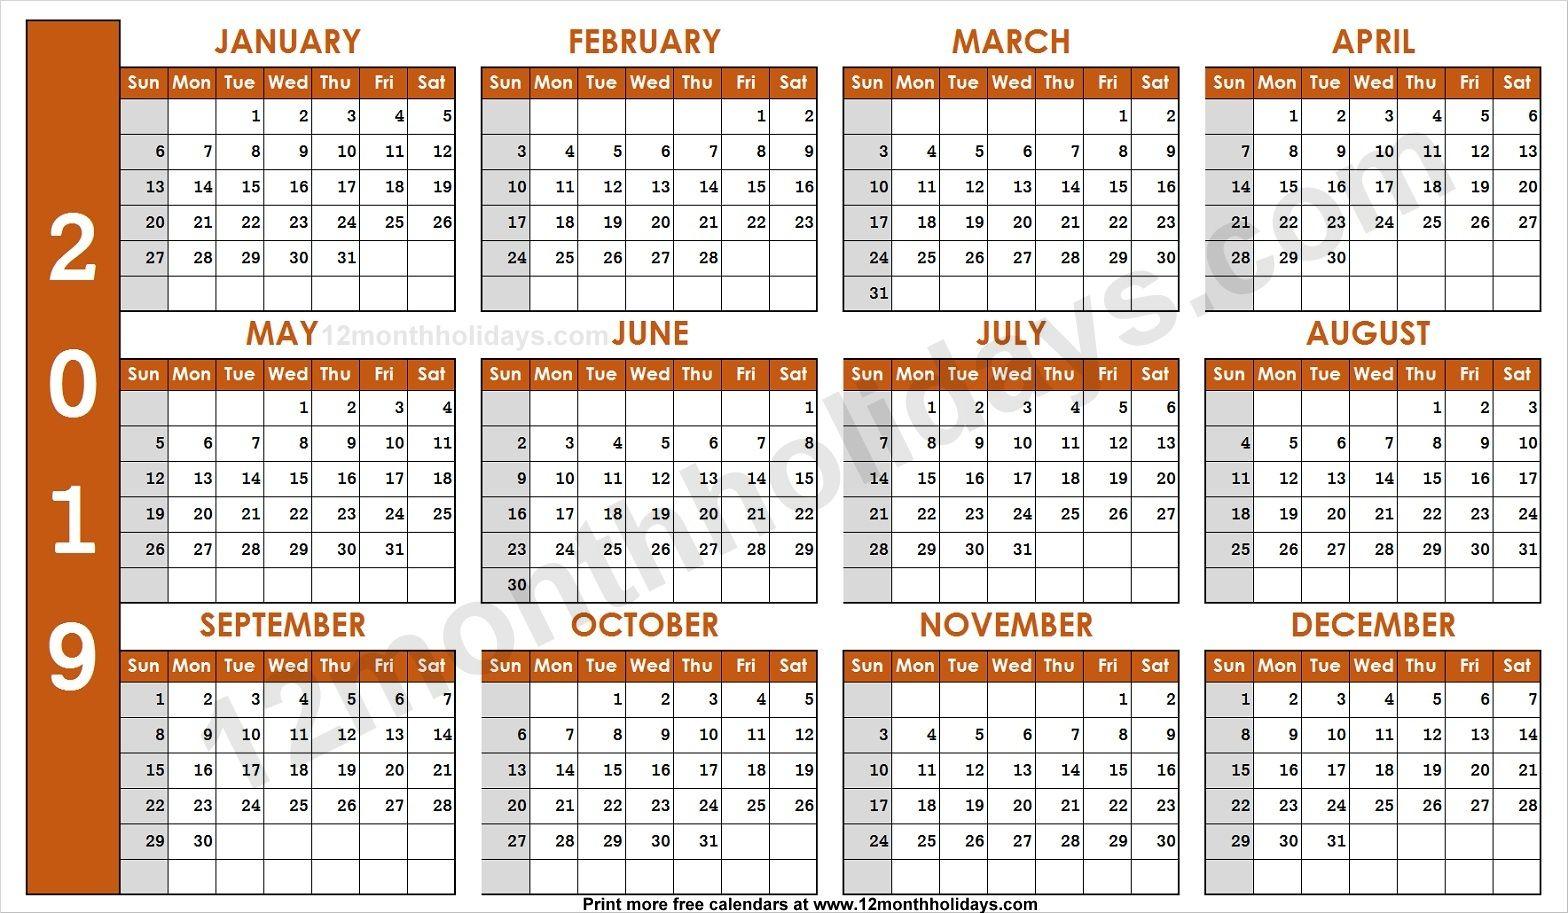 2019 Calendar Editable Template 2019 Yearly Calendar Calendar